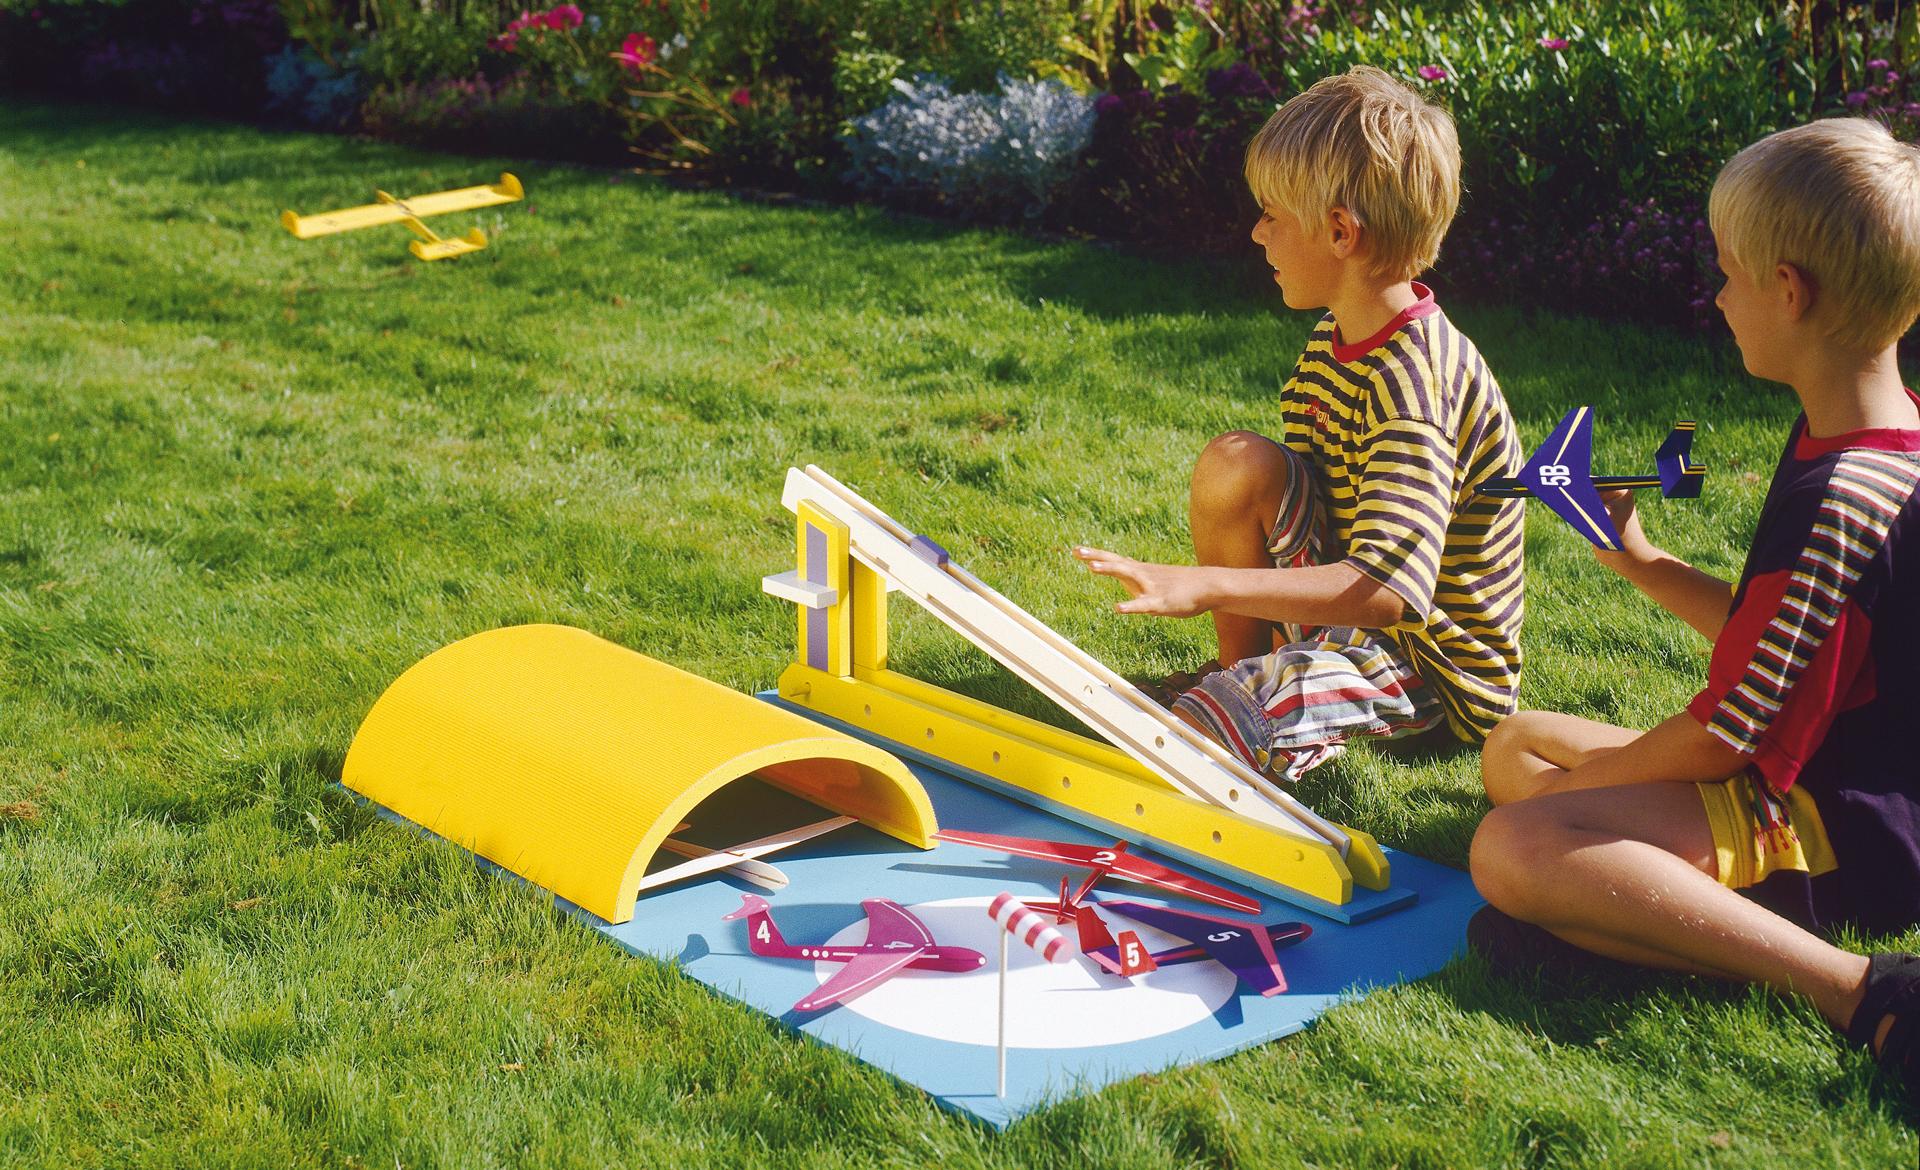 Bauplan: Modellflugzeuge basteln